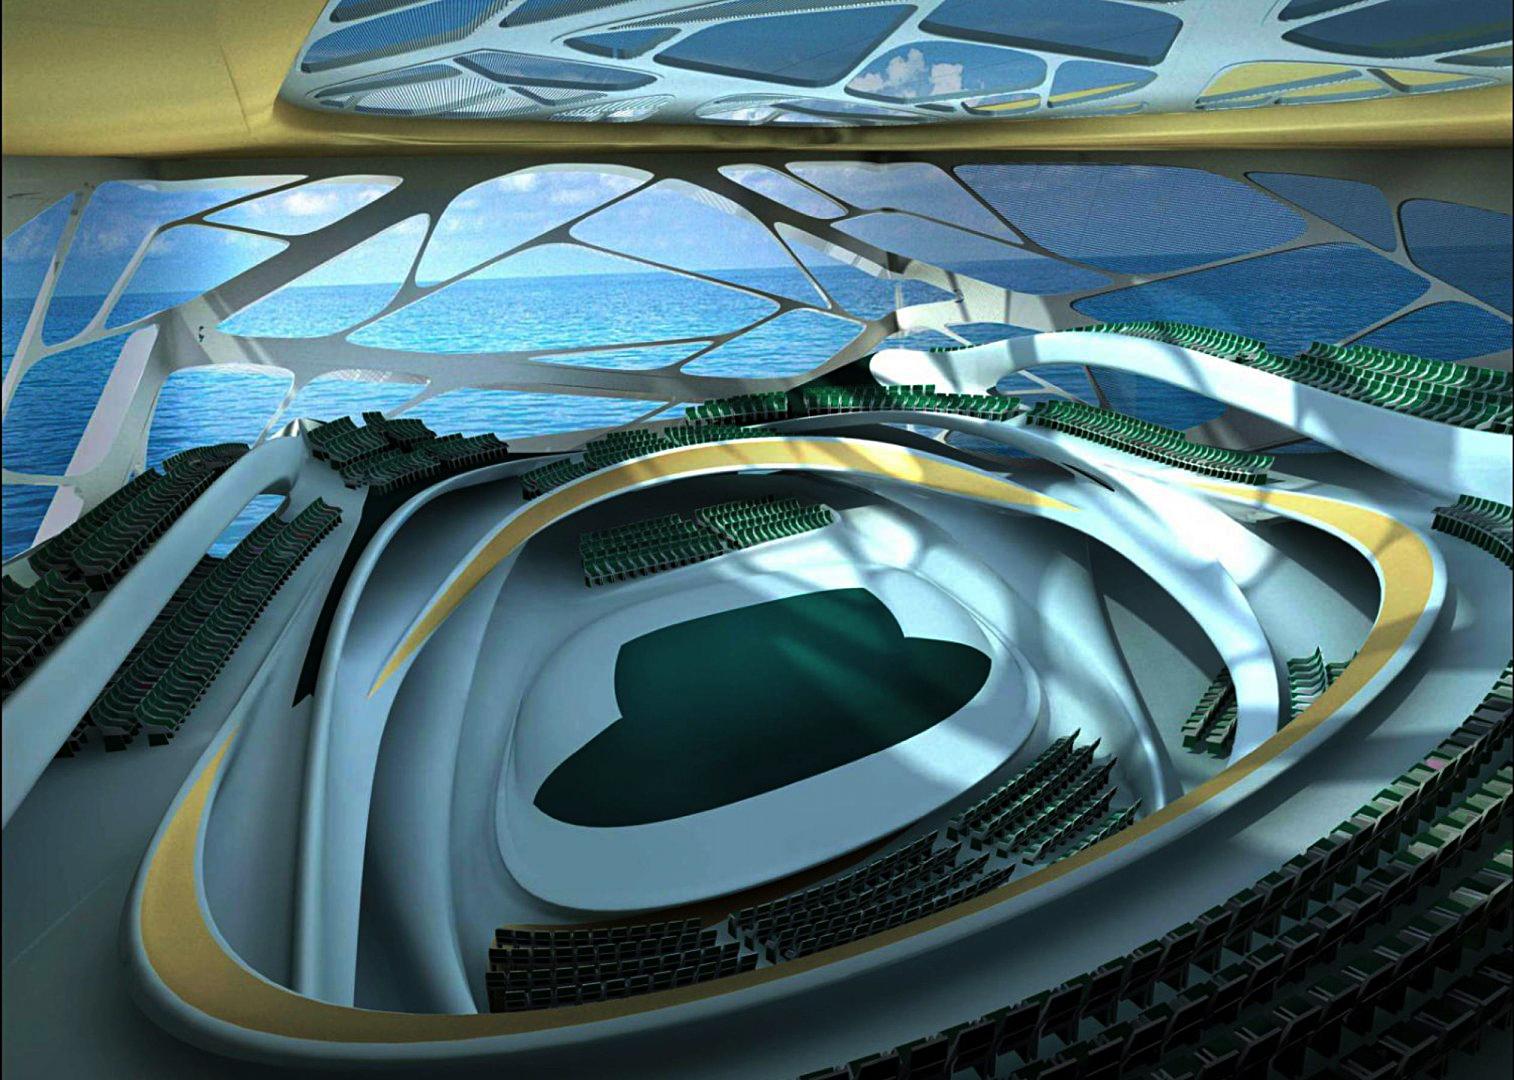 Abu Dhabi Performing Arts Centre 4